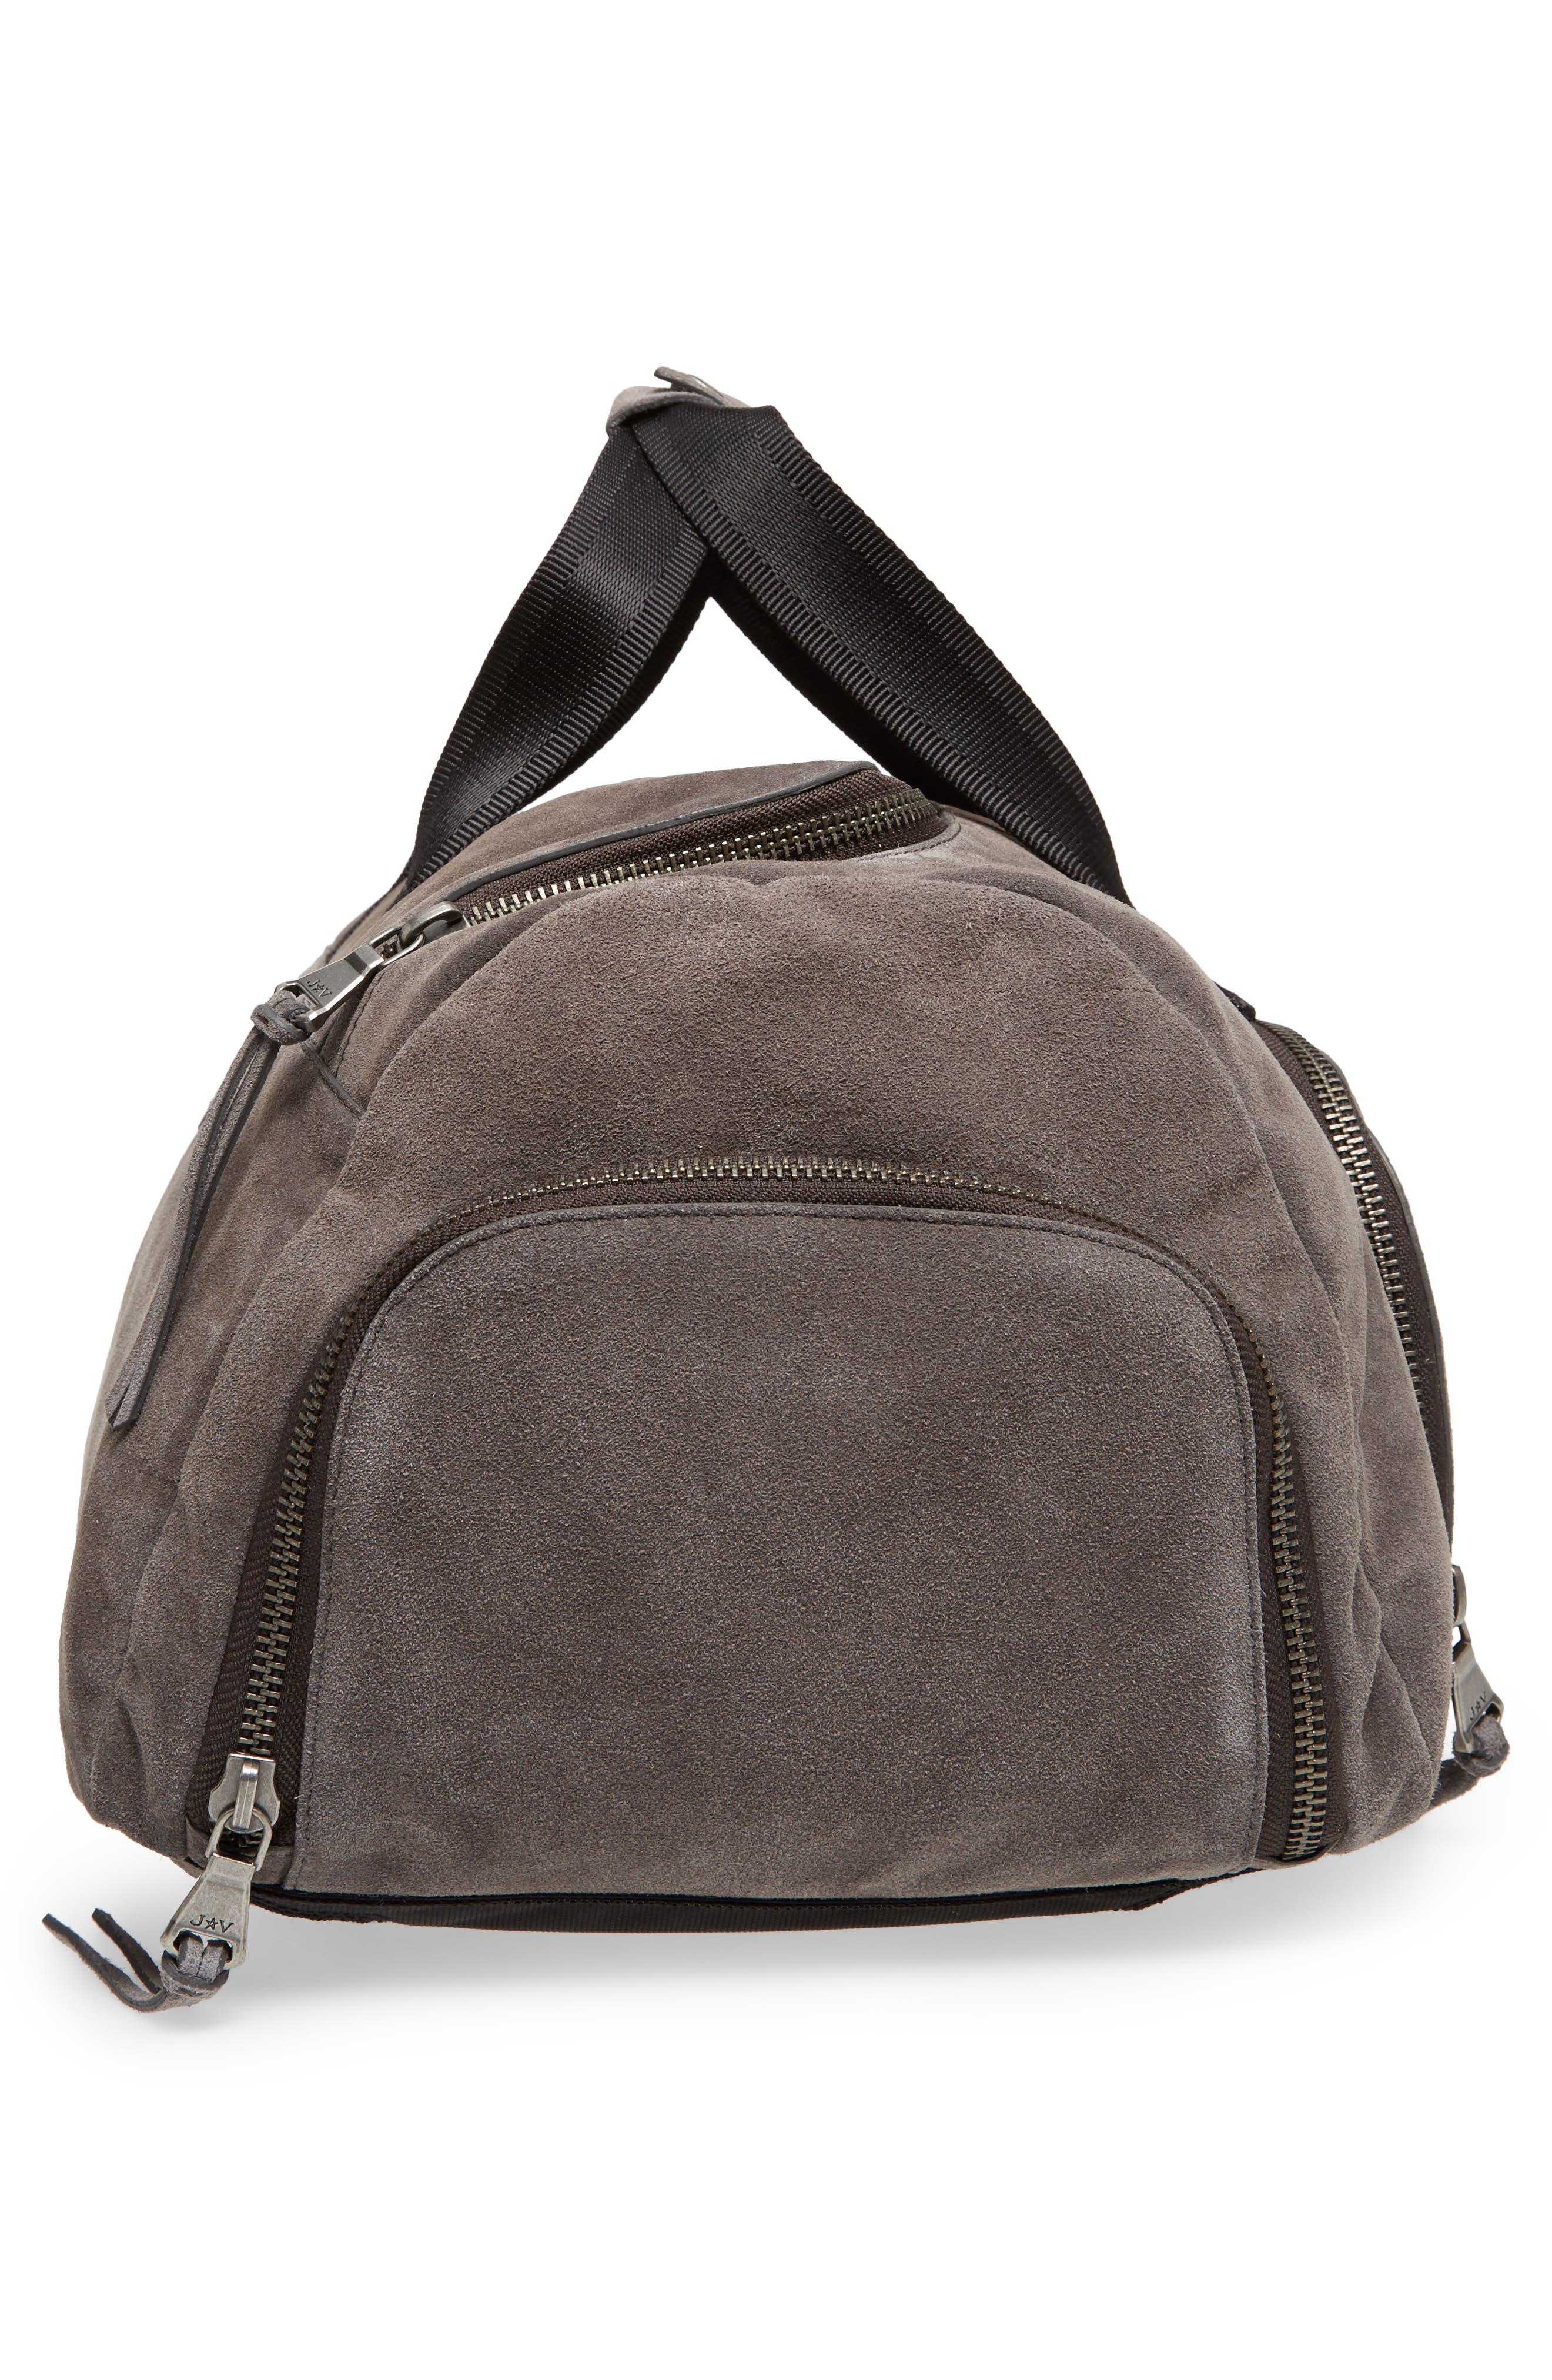 Brooklyn Suede Convertible Duffel Bag,                             Alternate thumbnail 6, color,                             Lead